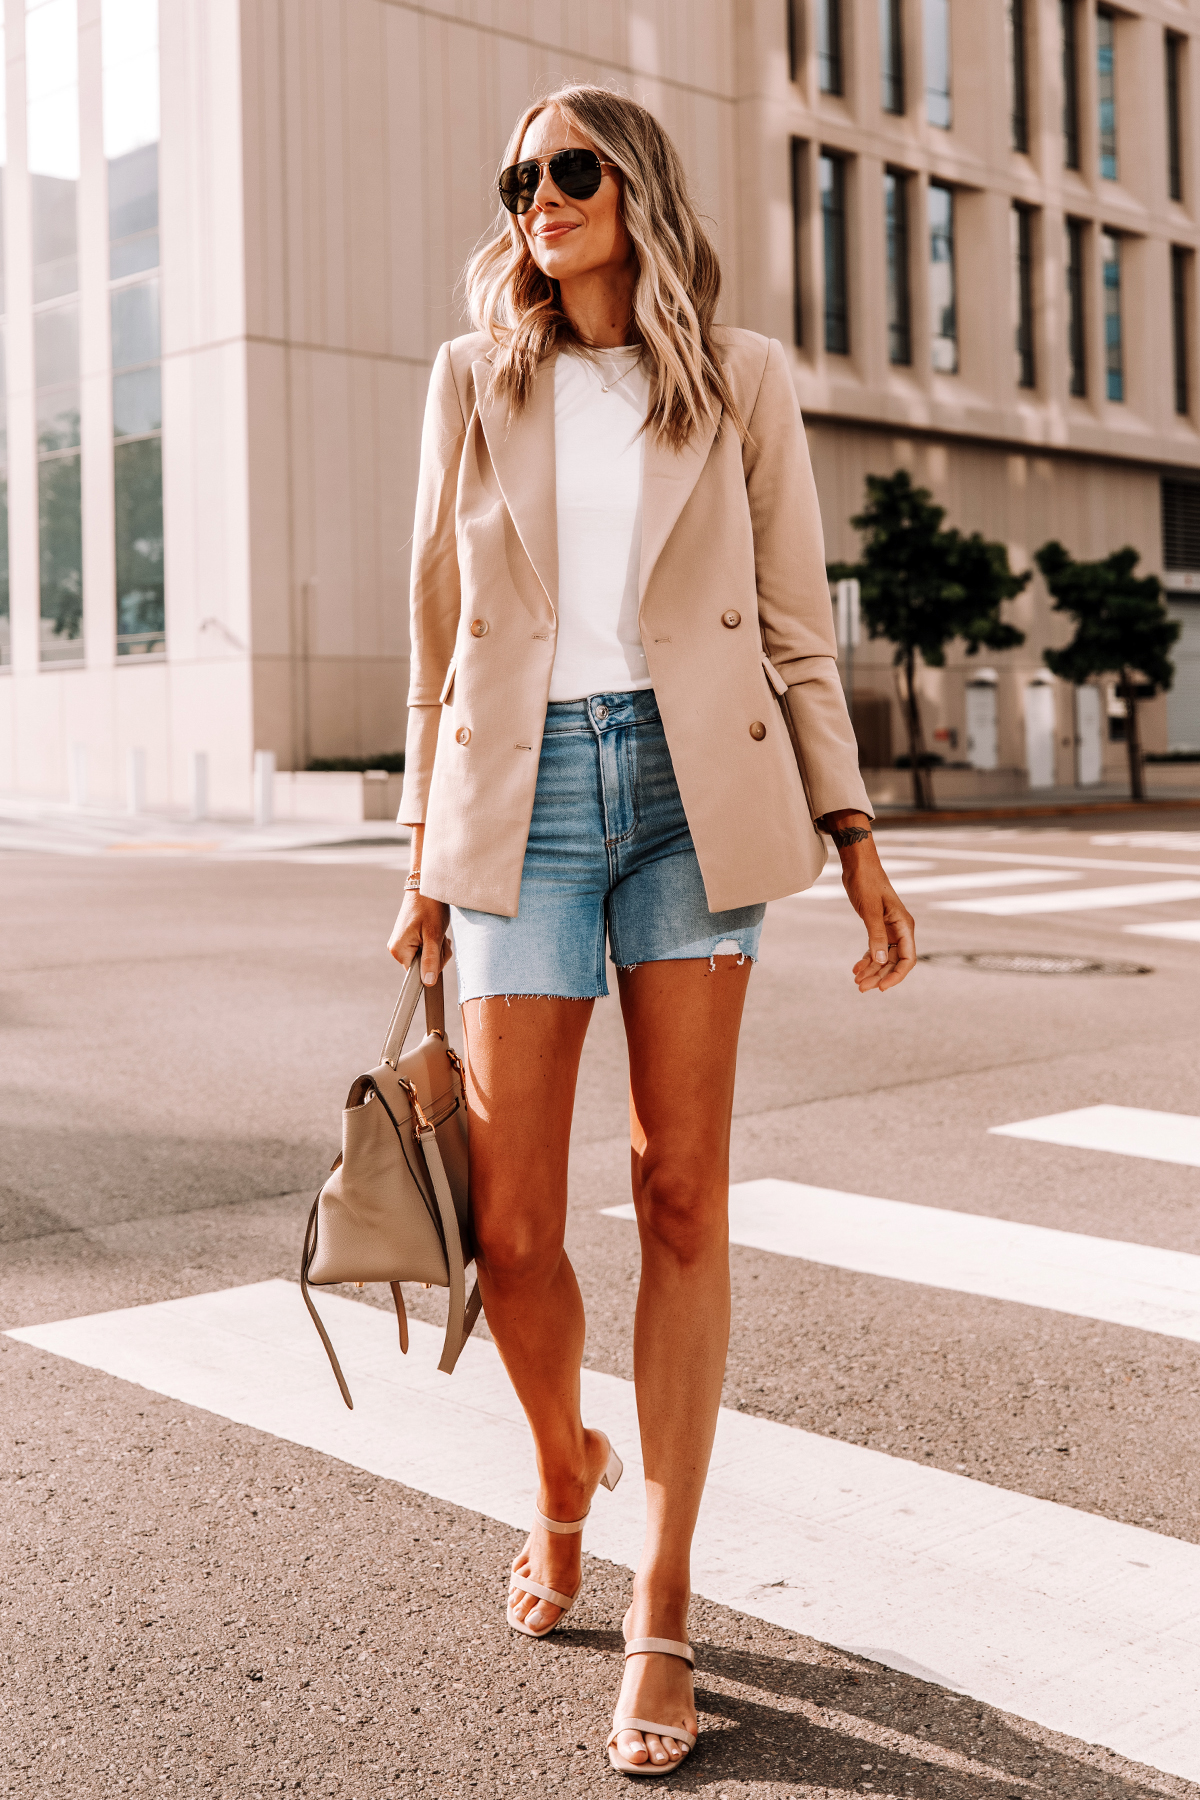 Fashion Jackson Wearing Tan Blazer White Tshirt Raw Hem Denim Shorts Tan Sandals Celine Belt Bag 1